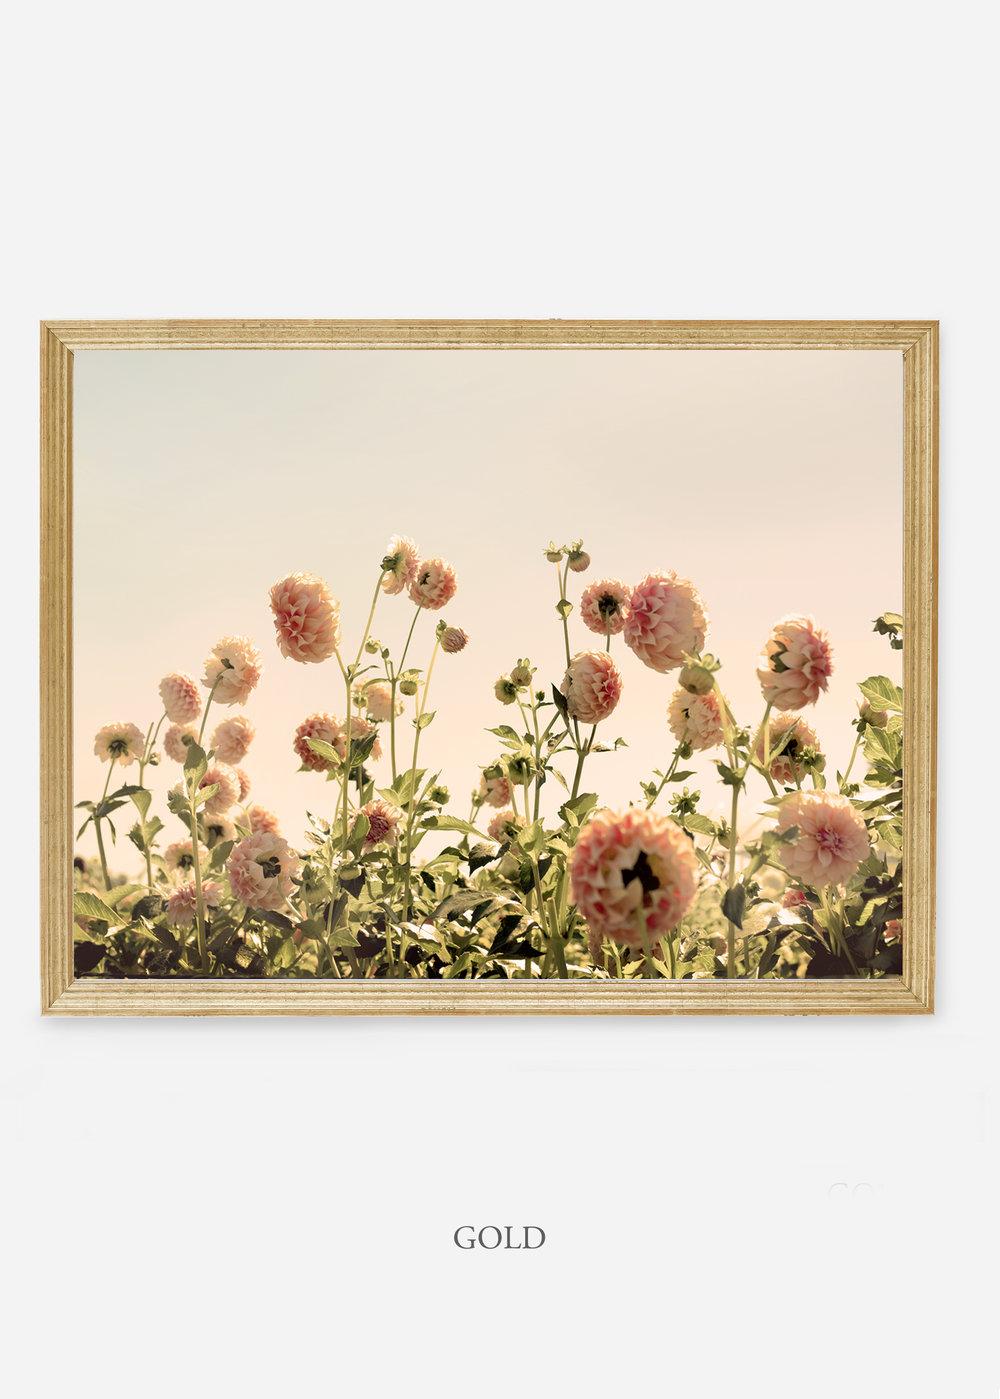 NoMat_GoldFrame_DahliaNo.1_WilderCalifornia_Art_Floral_Homedecor_Prints_Dahlia_Botanical_Artwork_Interiordesign.jpg